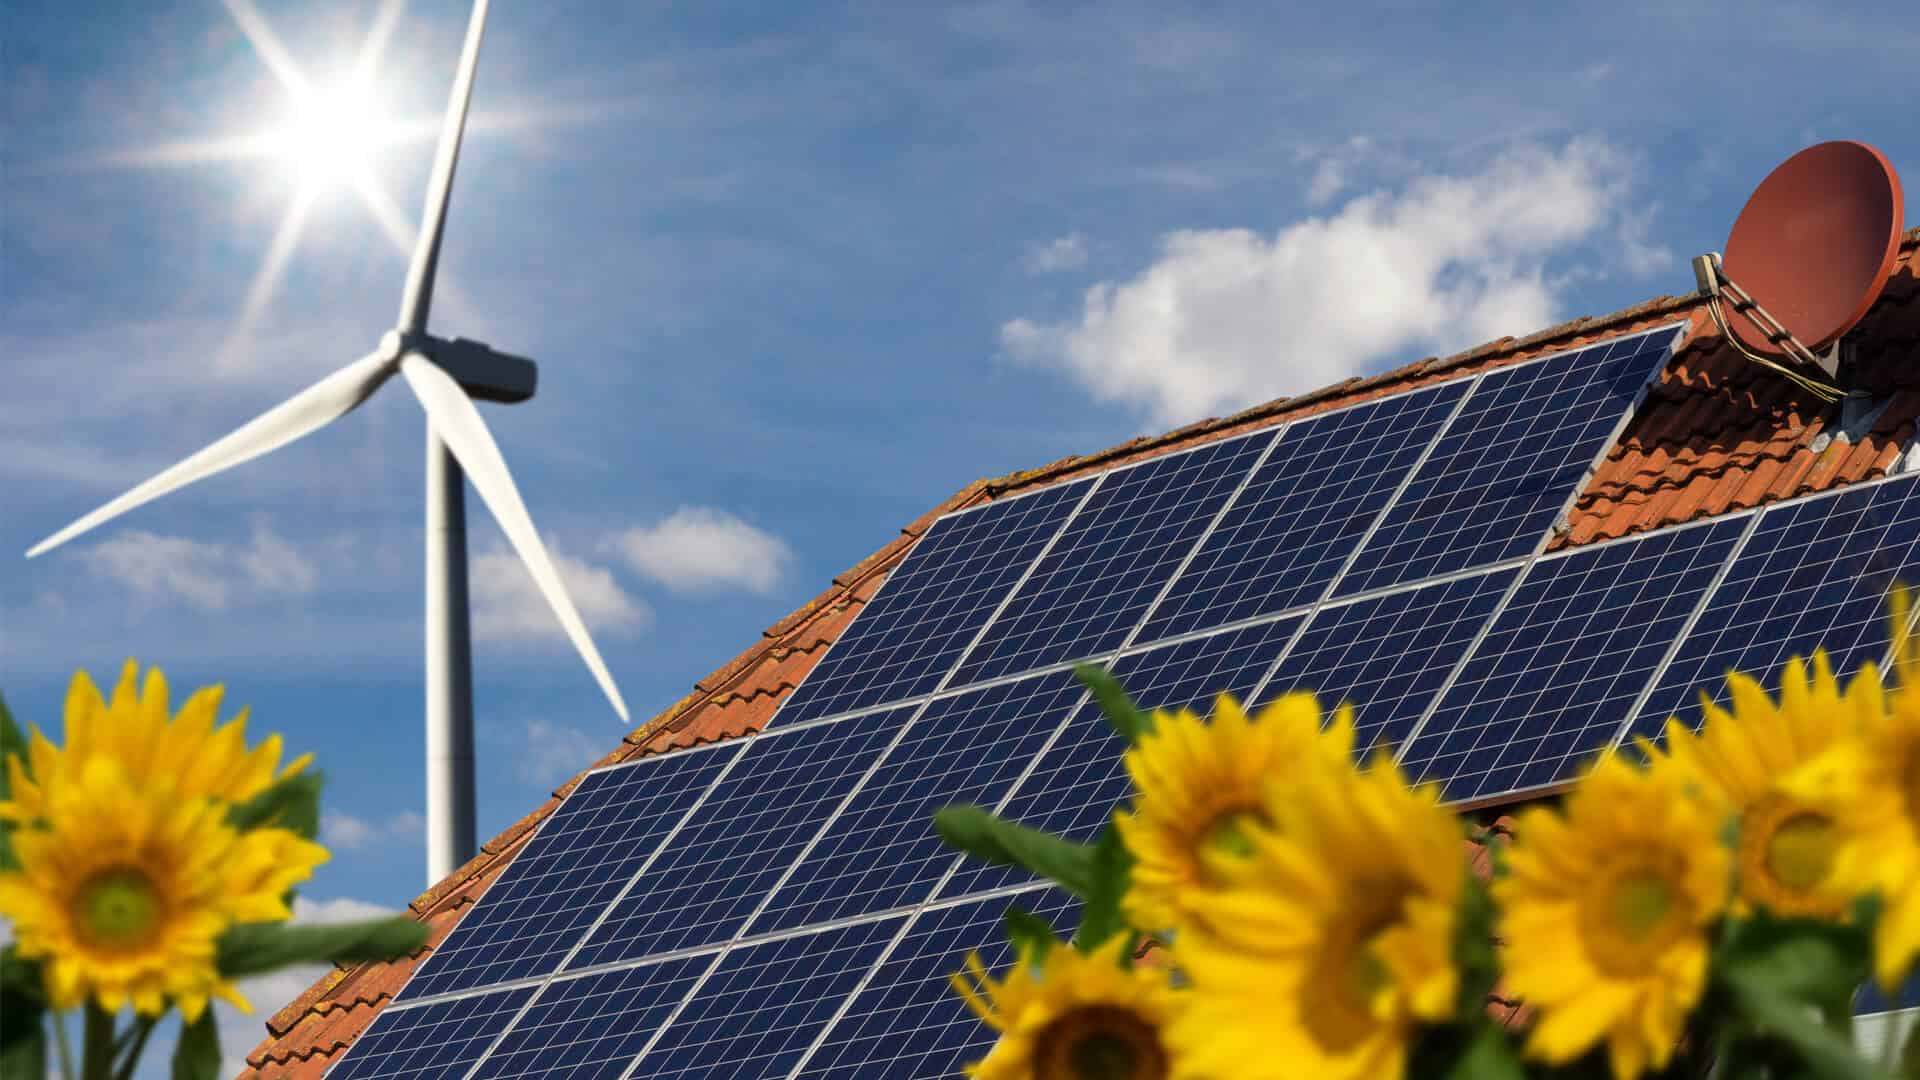 solar power panels on roof